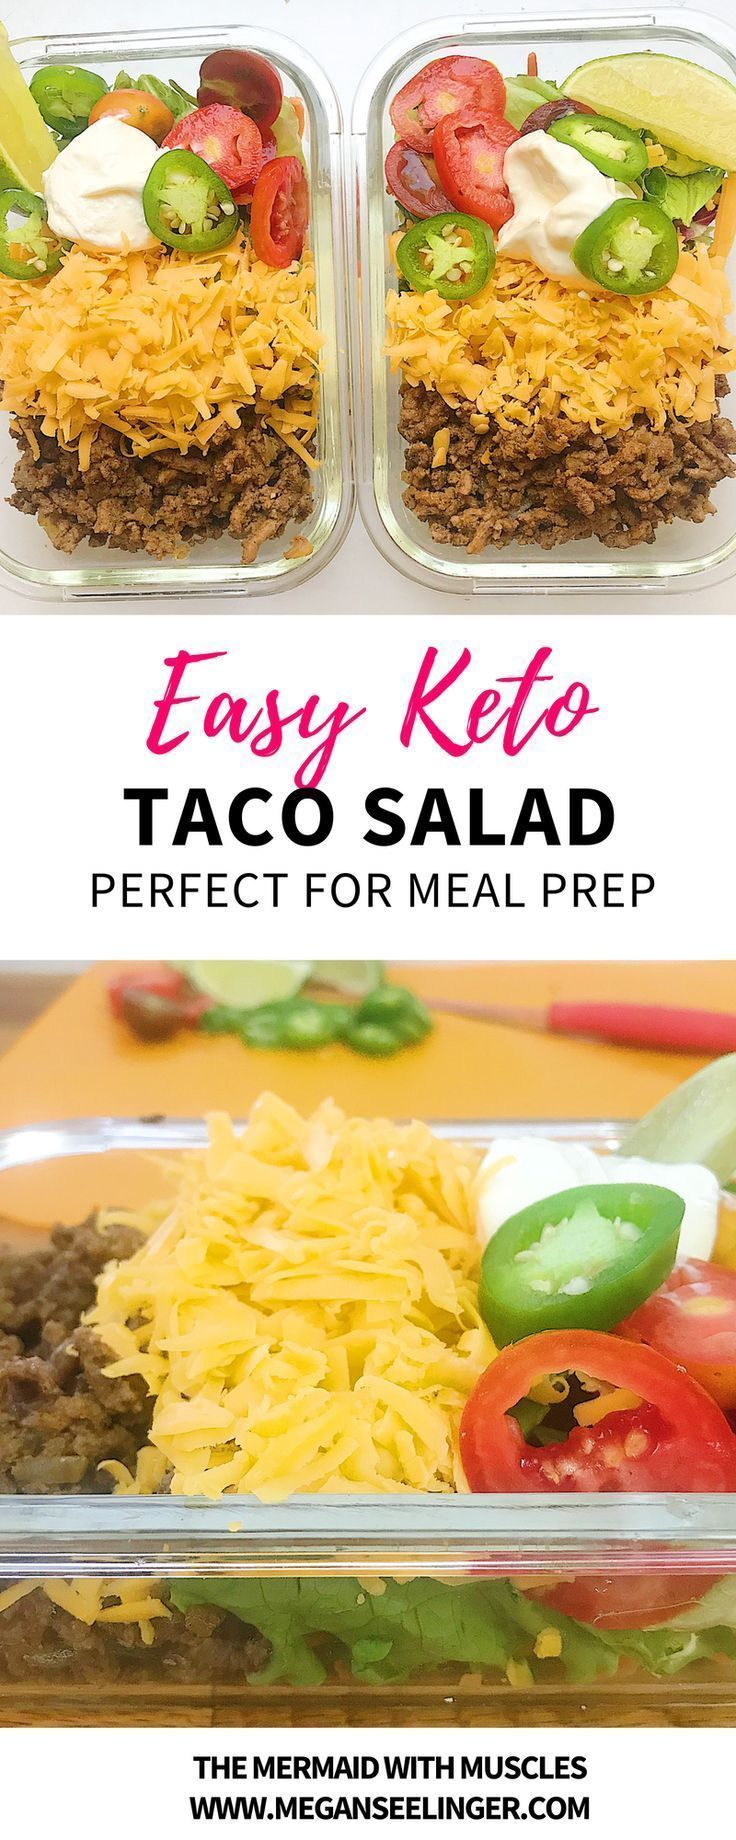 Keto Taco Salad - Easy Keto Ground Beef images